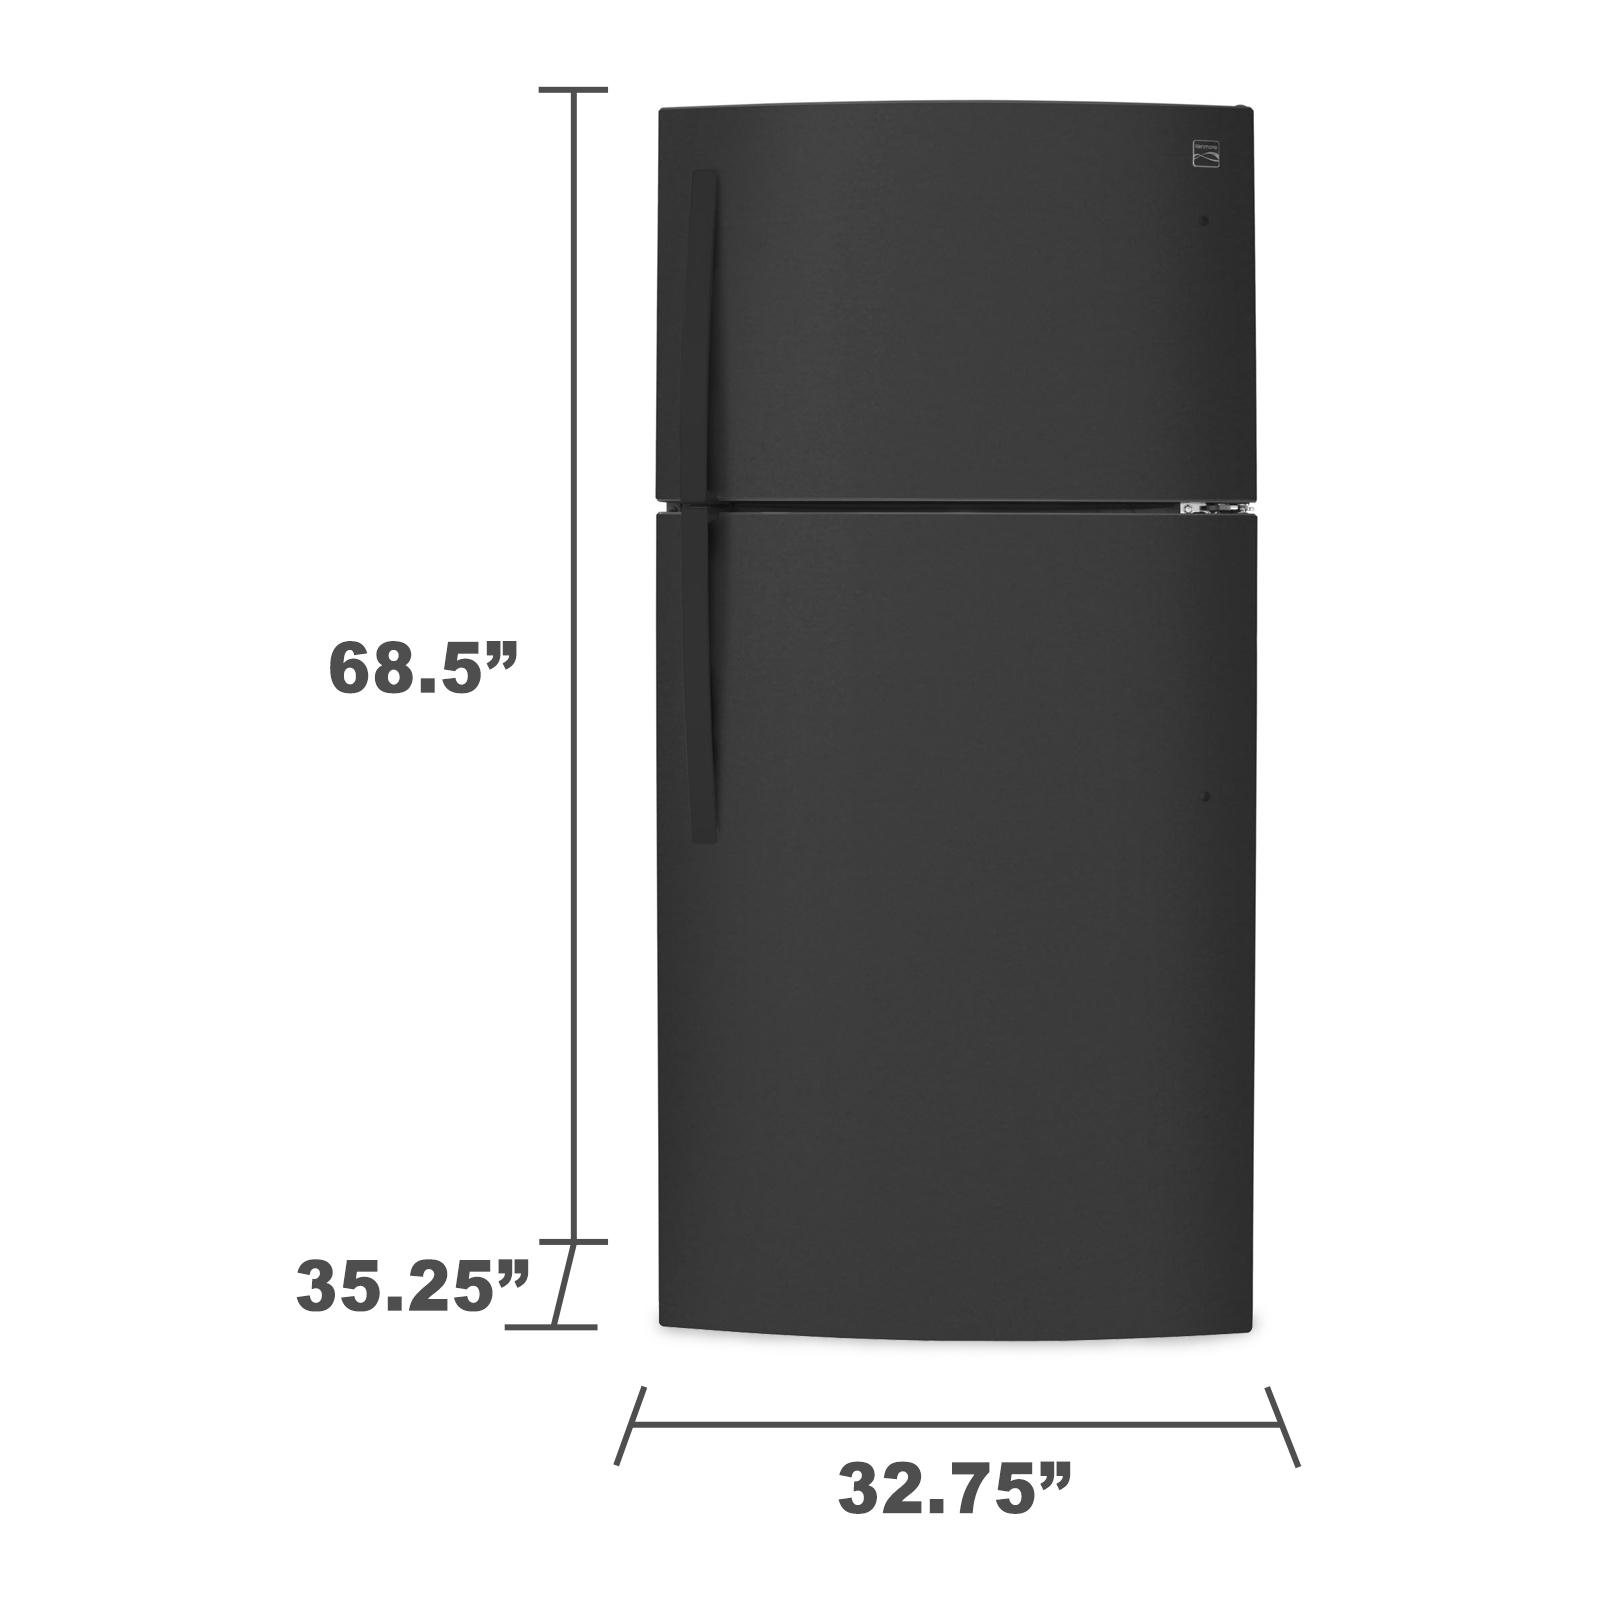 Kenmore 78039 23.8 cu. ft. Top-Freezer Refrigerator w/ Icemaker - Black